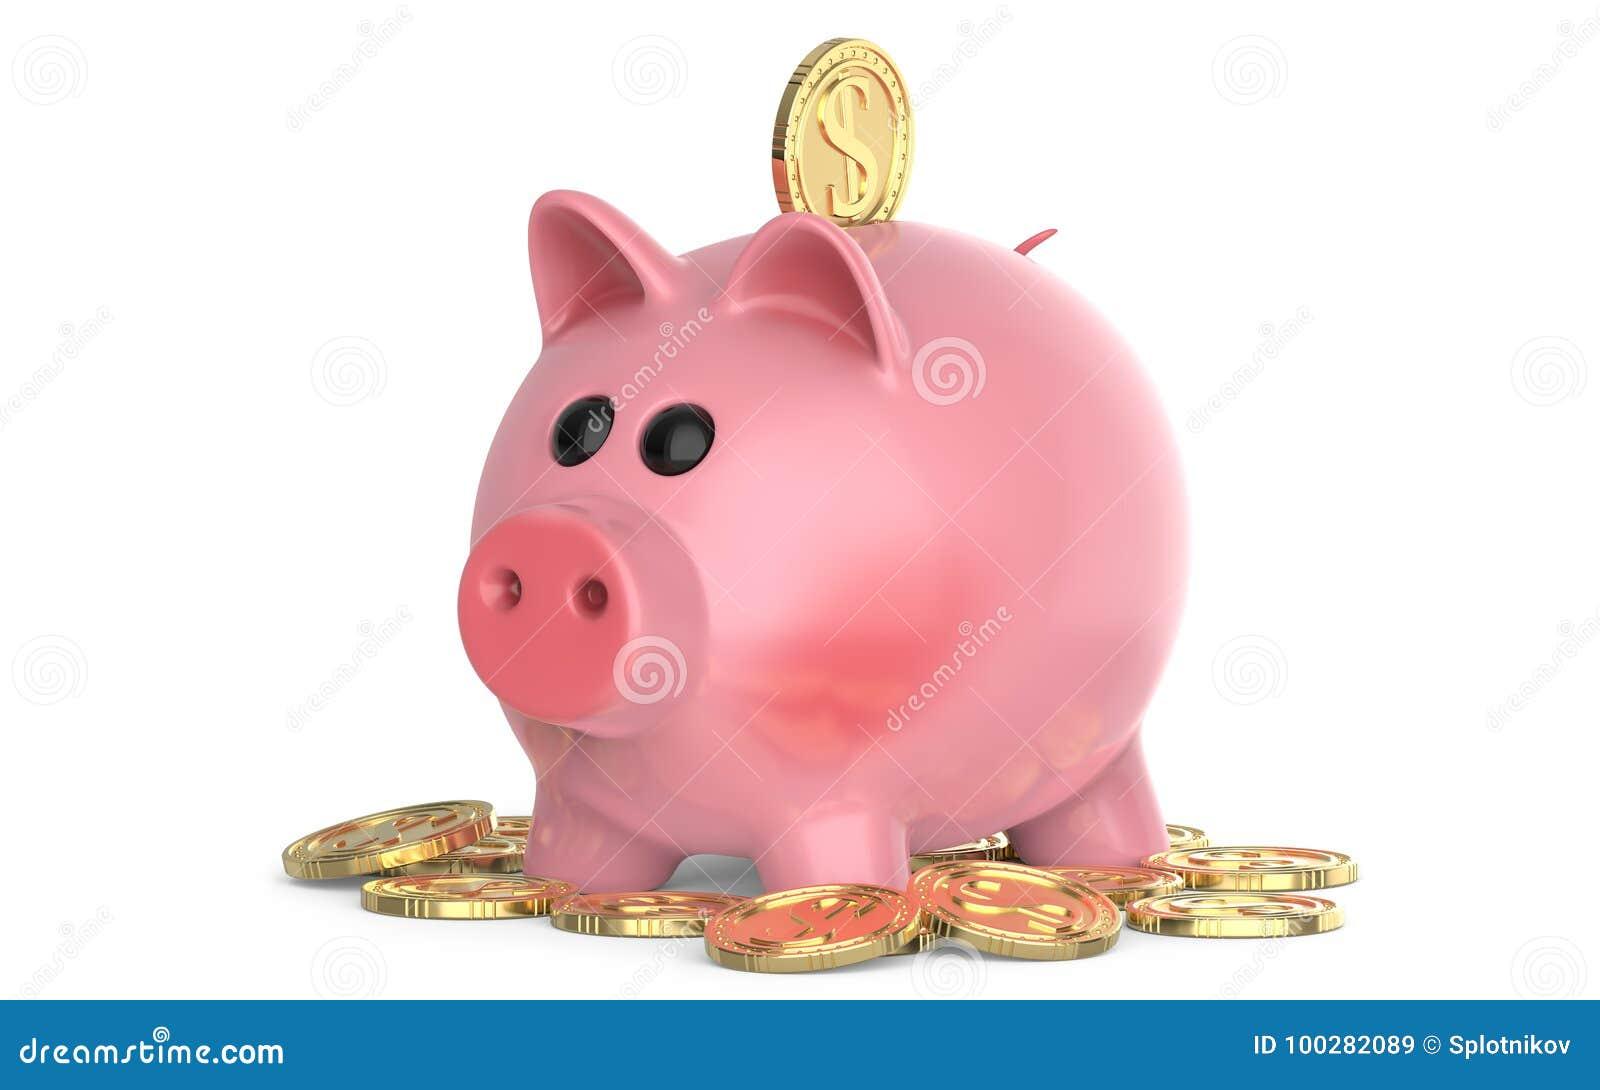 Spiele Piggy Bank - Video Slots Online